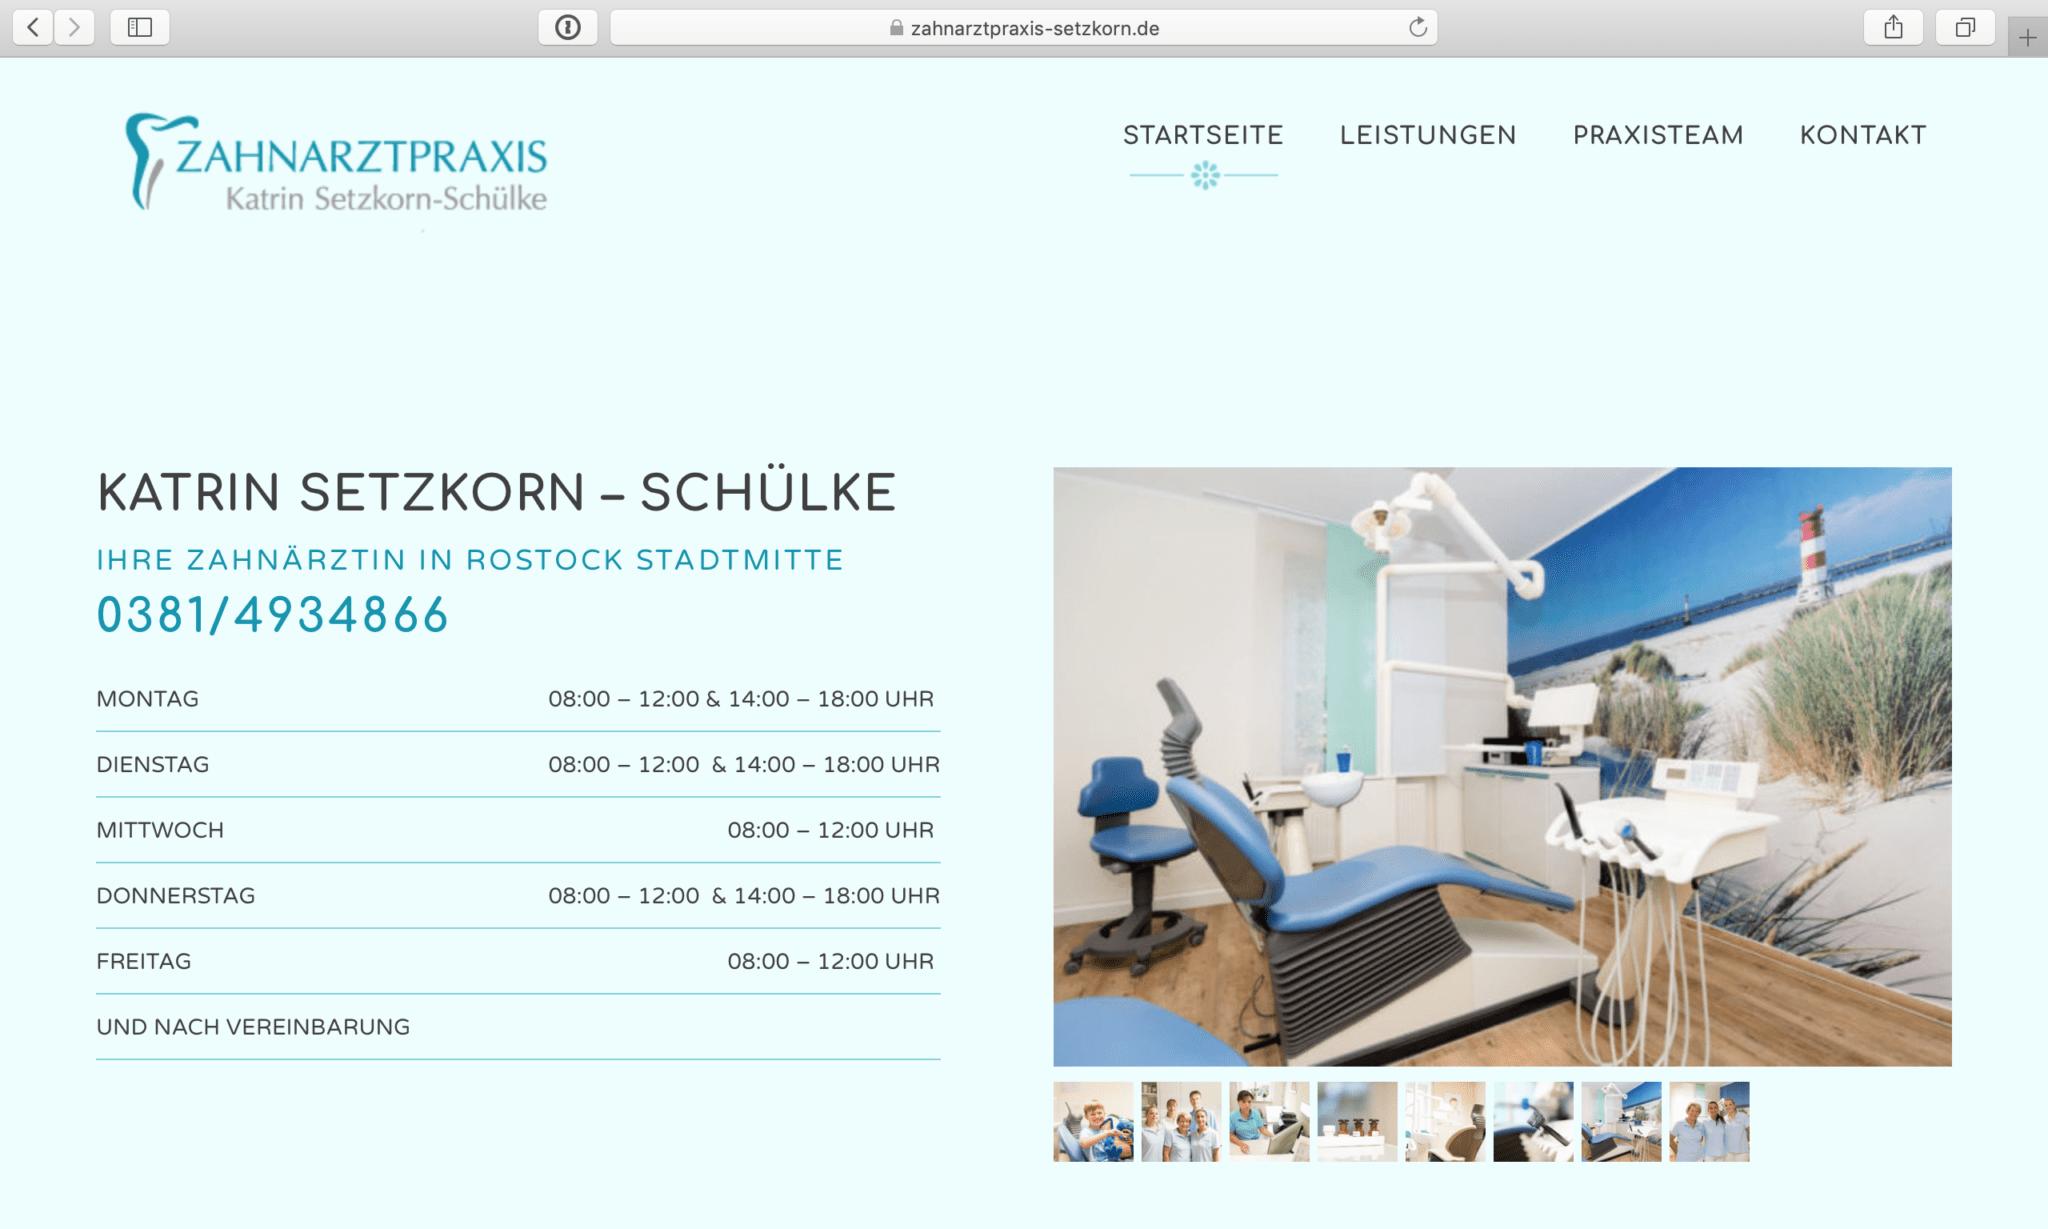 zahnarztpraxis-setzkorn.de 1